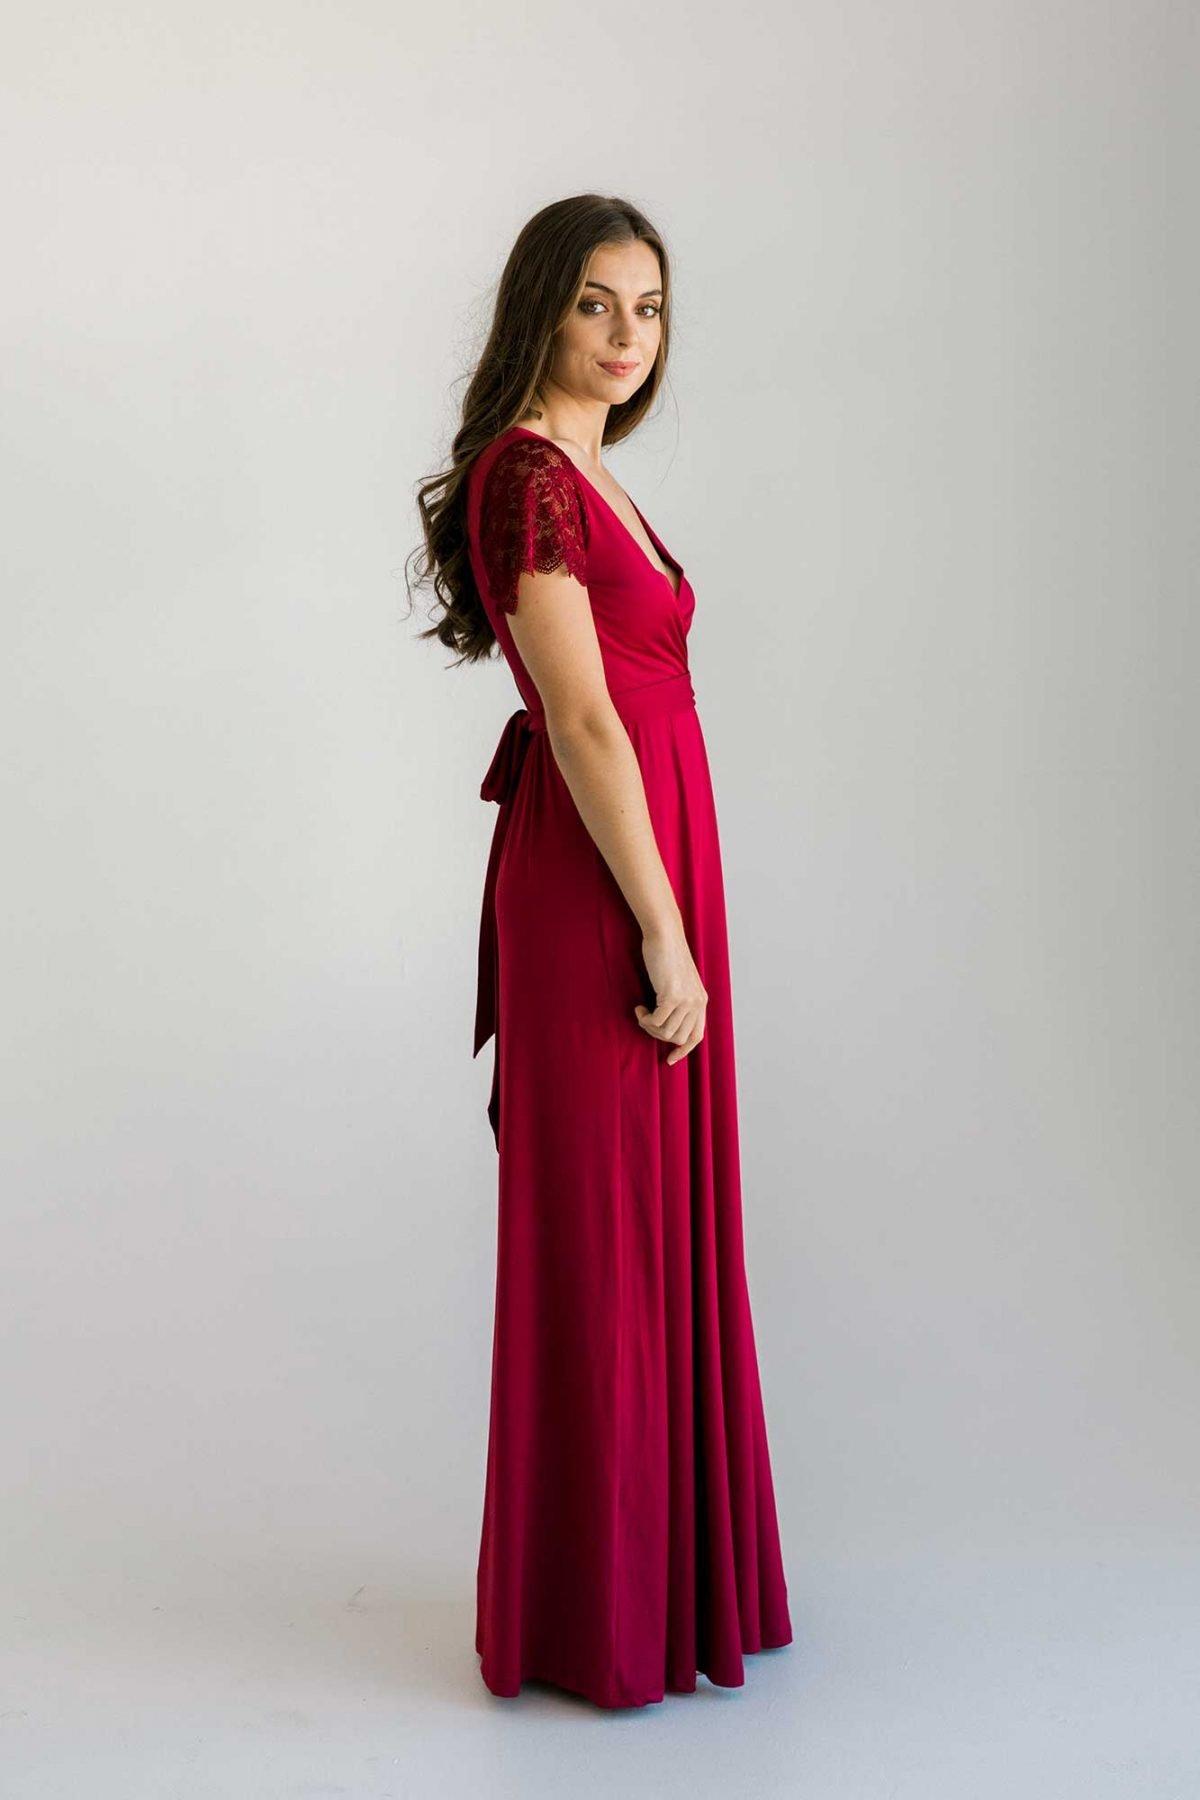 Rosetta dress in claret dress side view